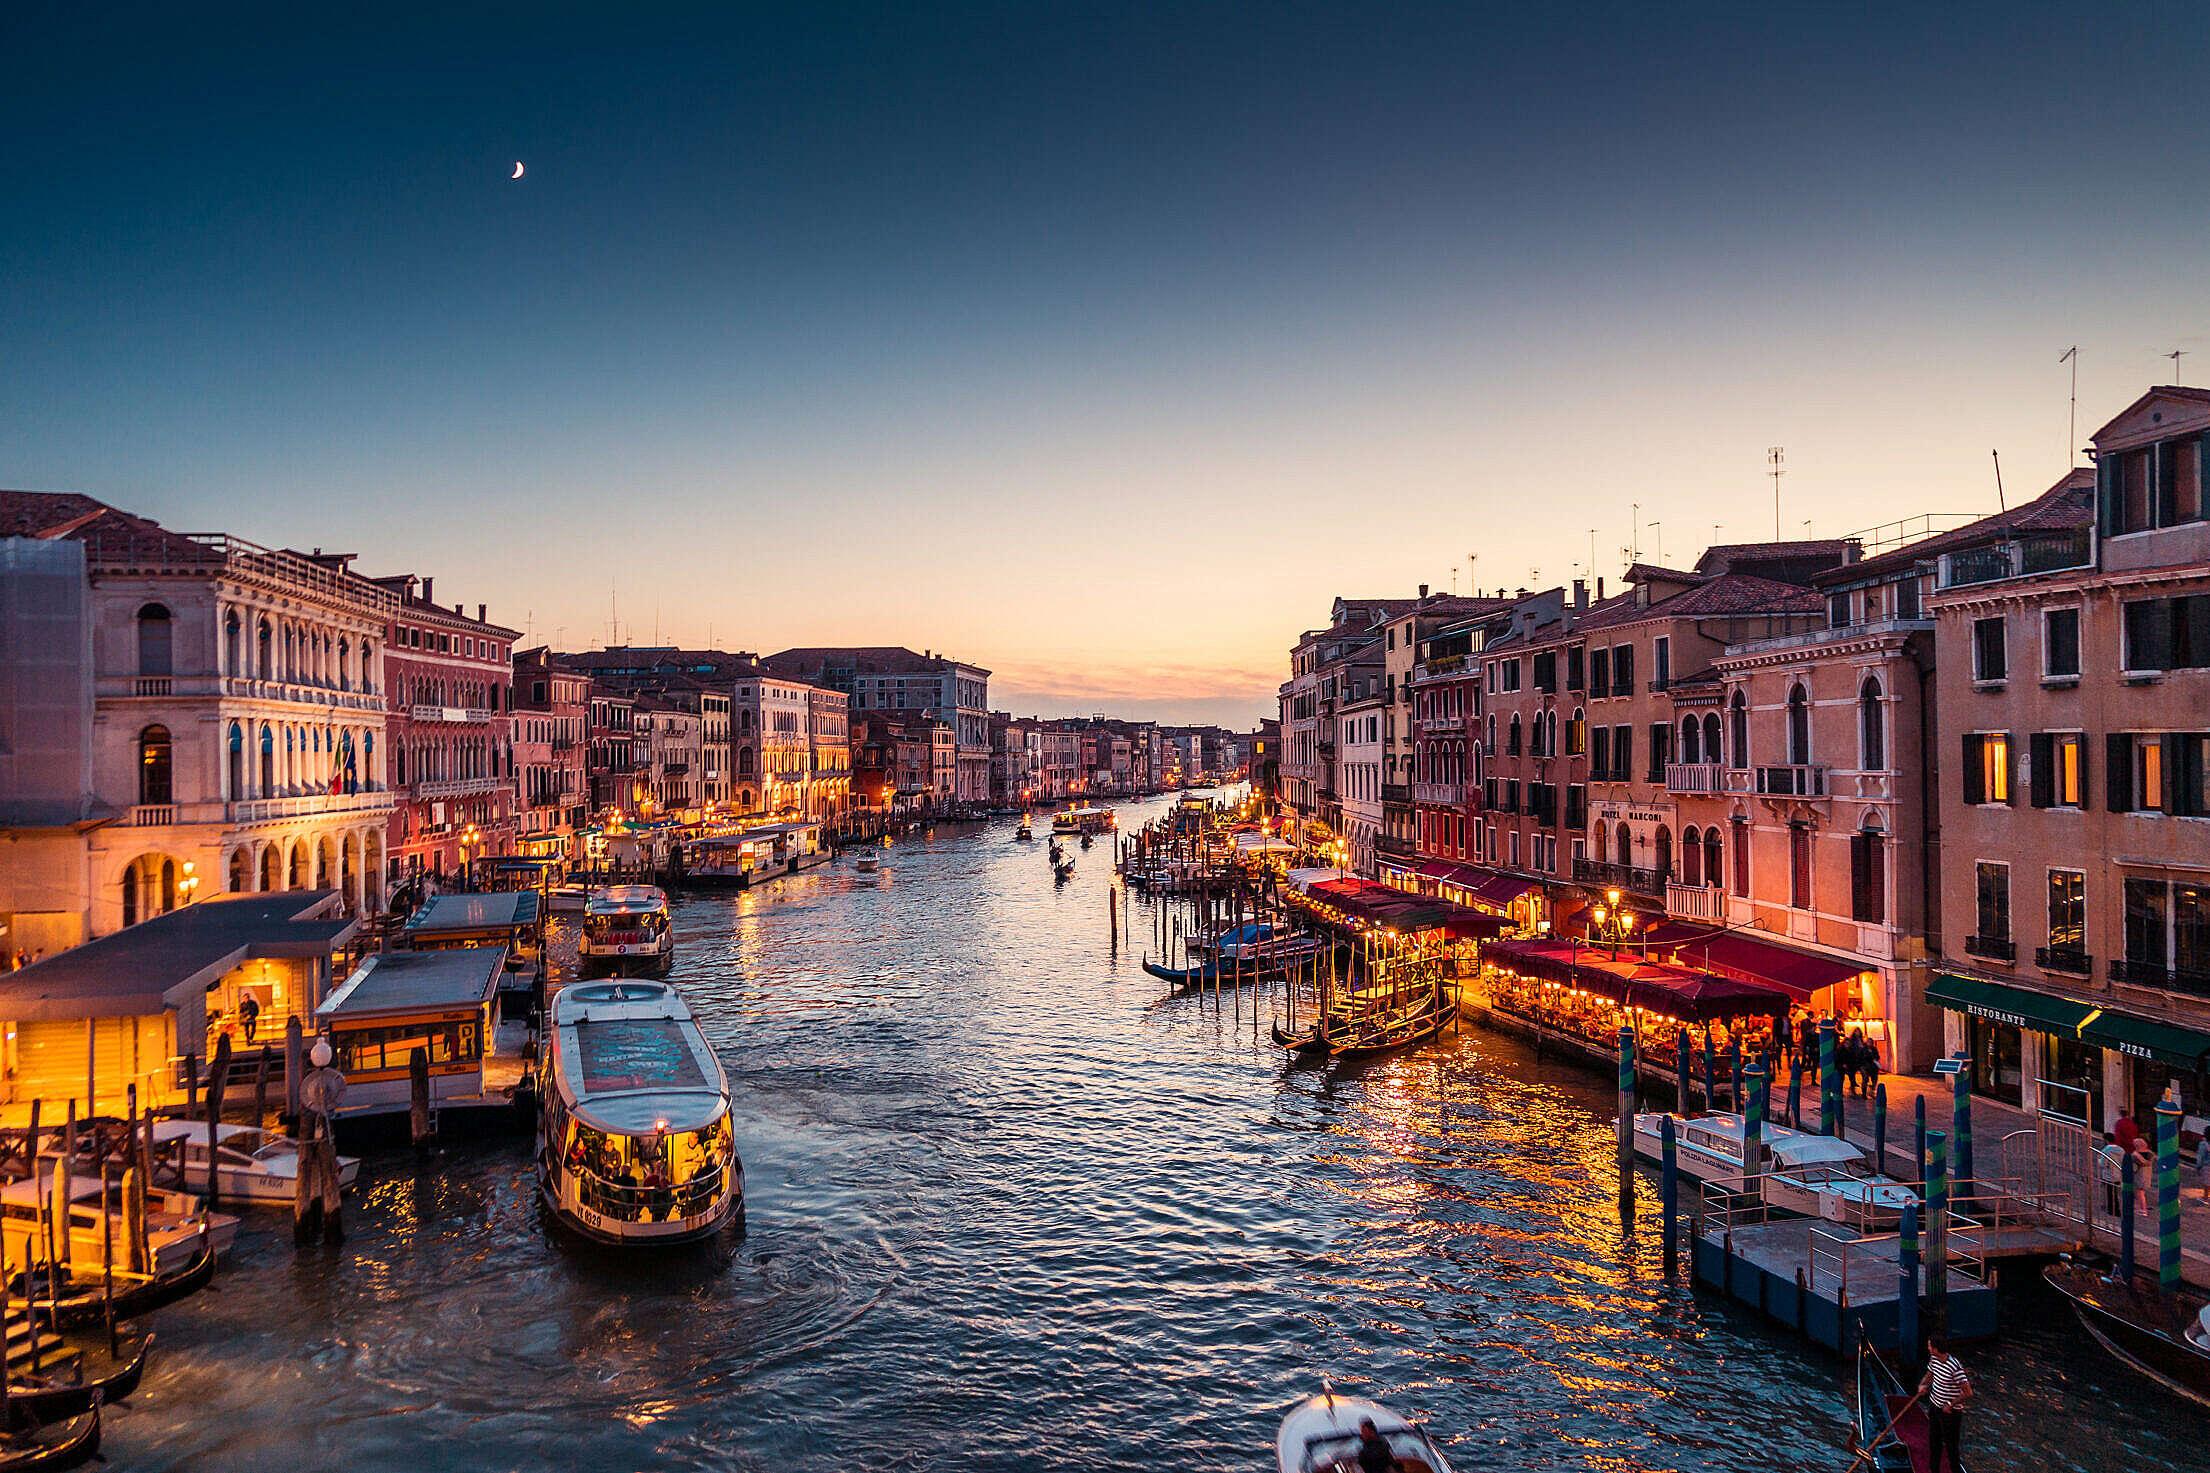 Venice Italy Canal Grande at Night Free Stock Photo